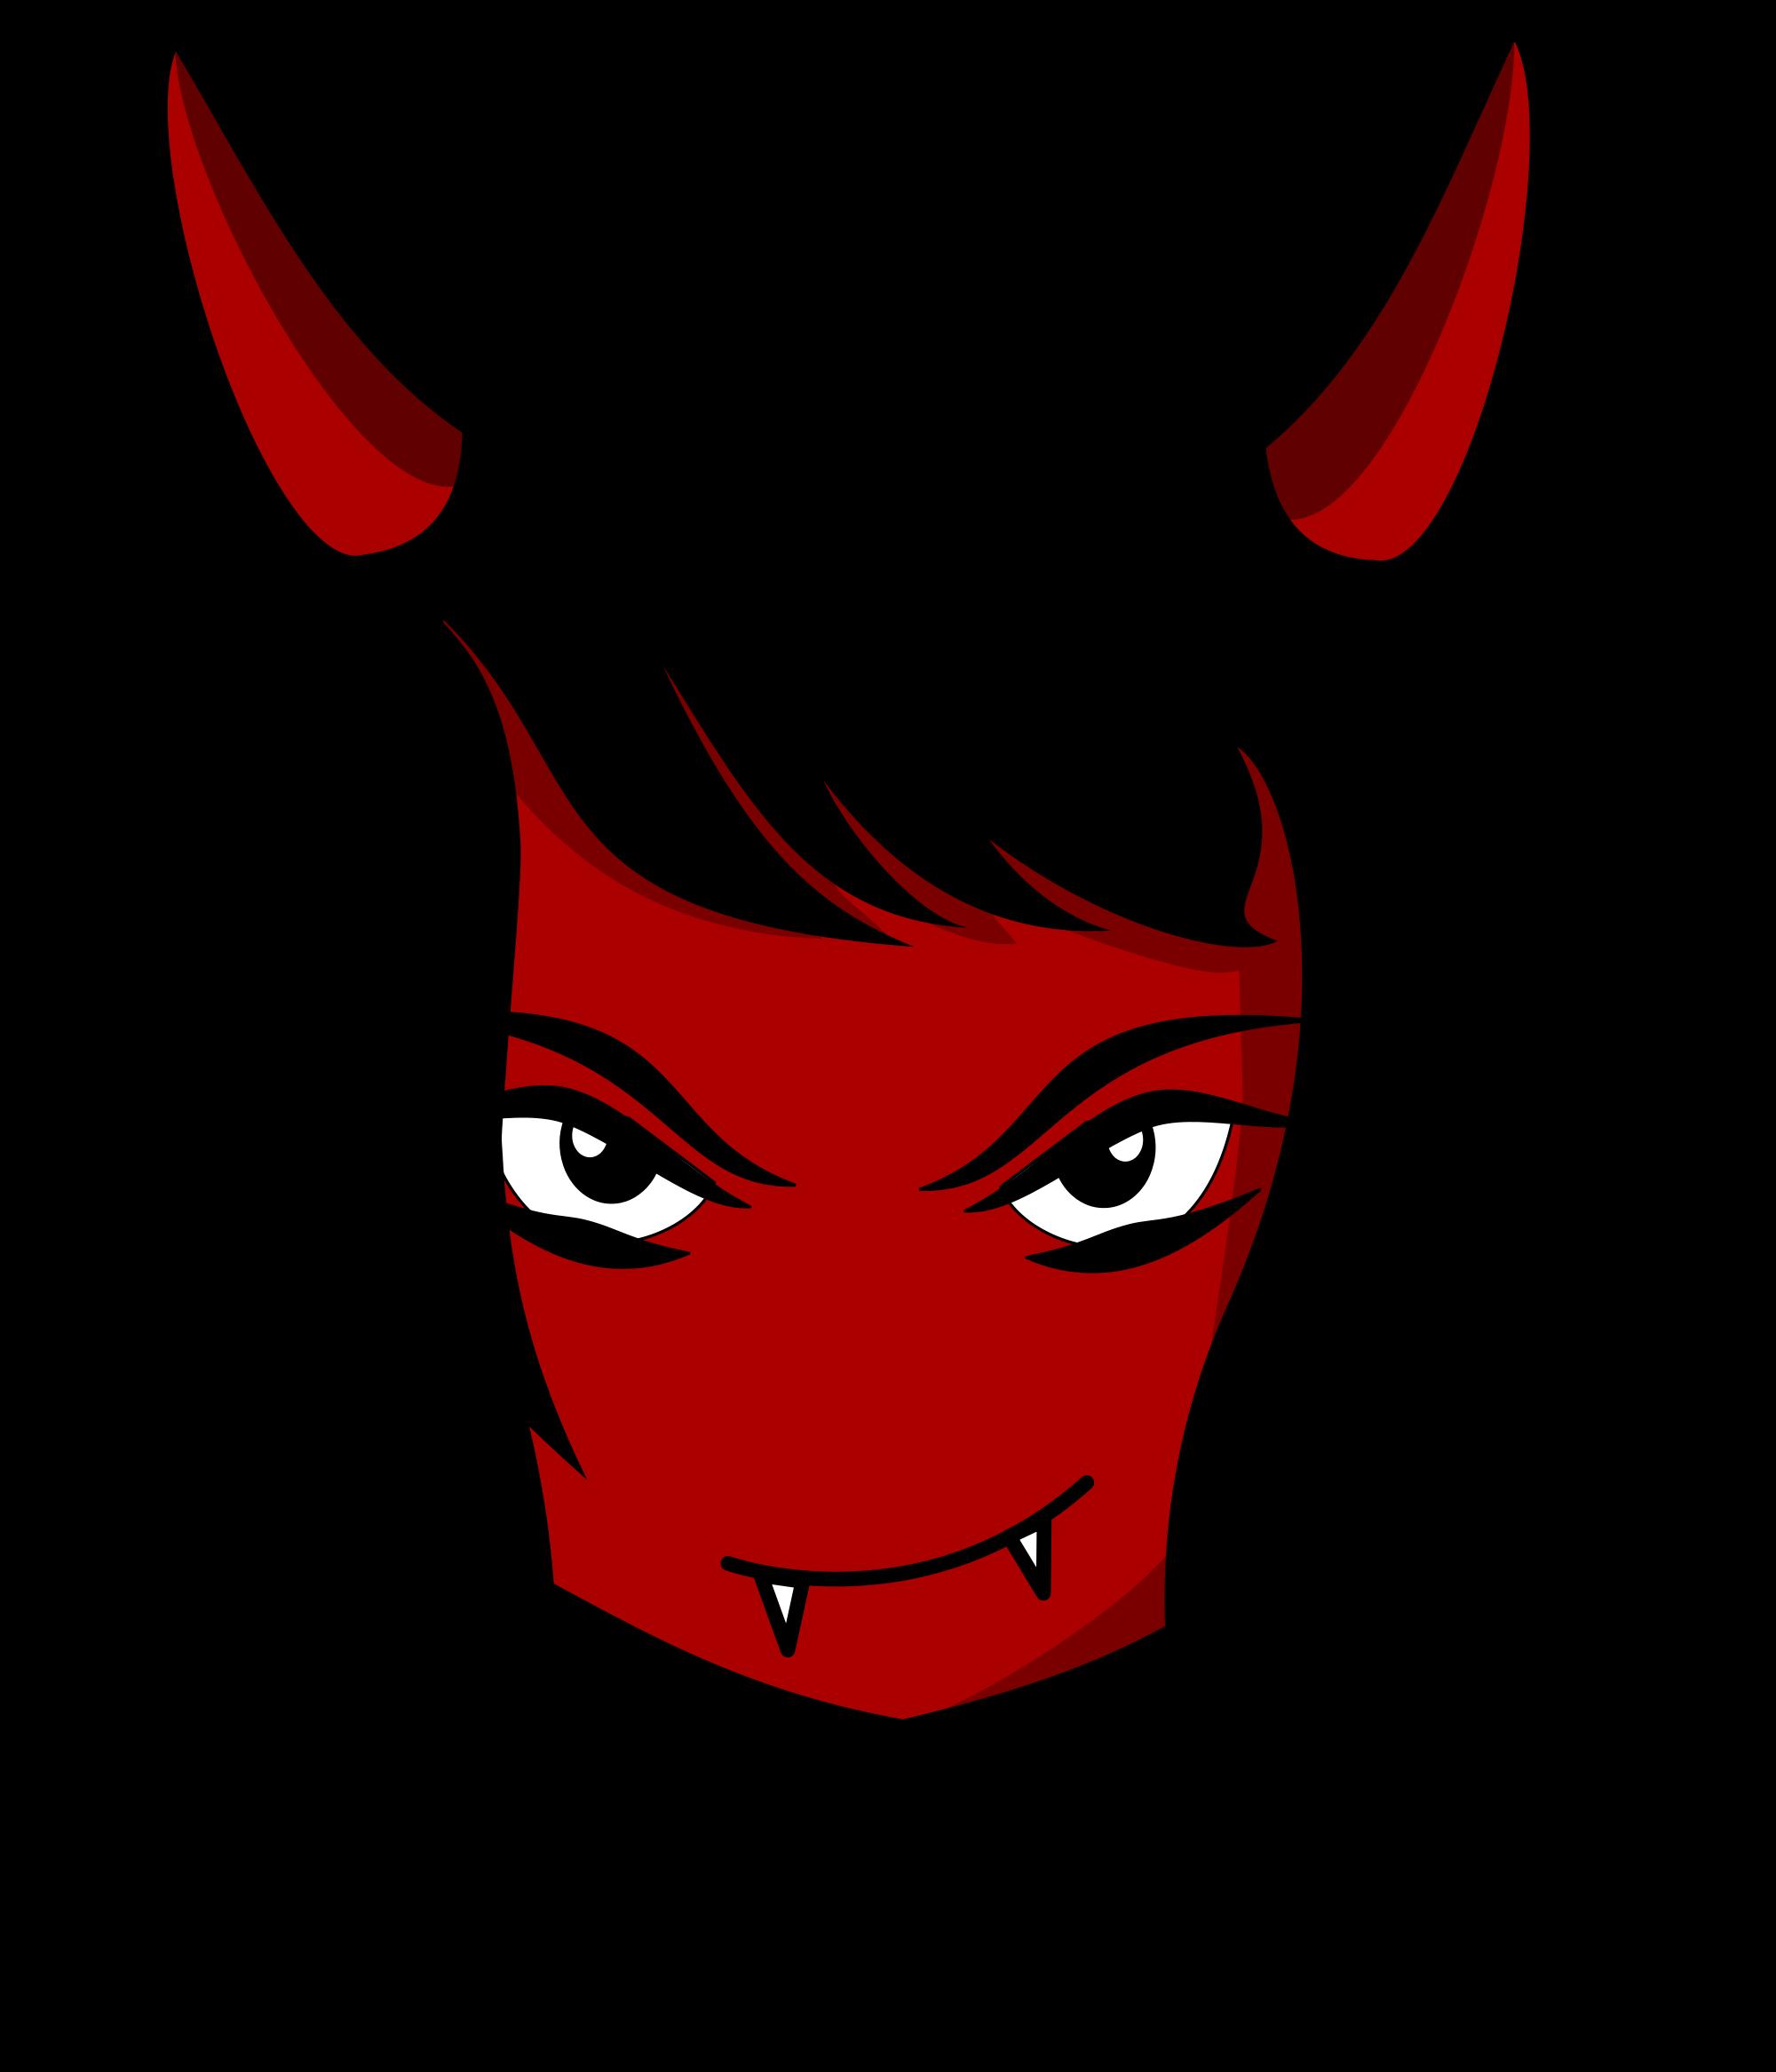 Evil PNG - 11265